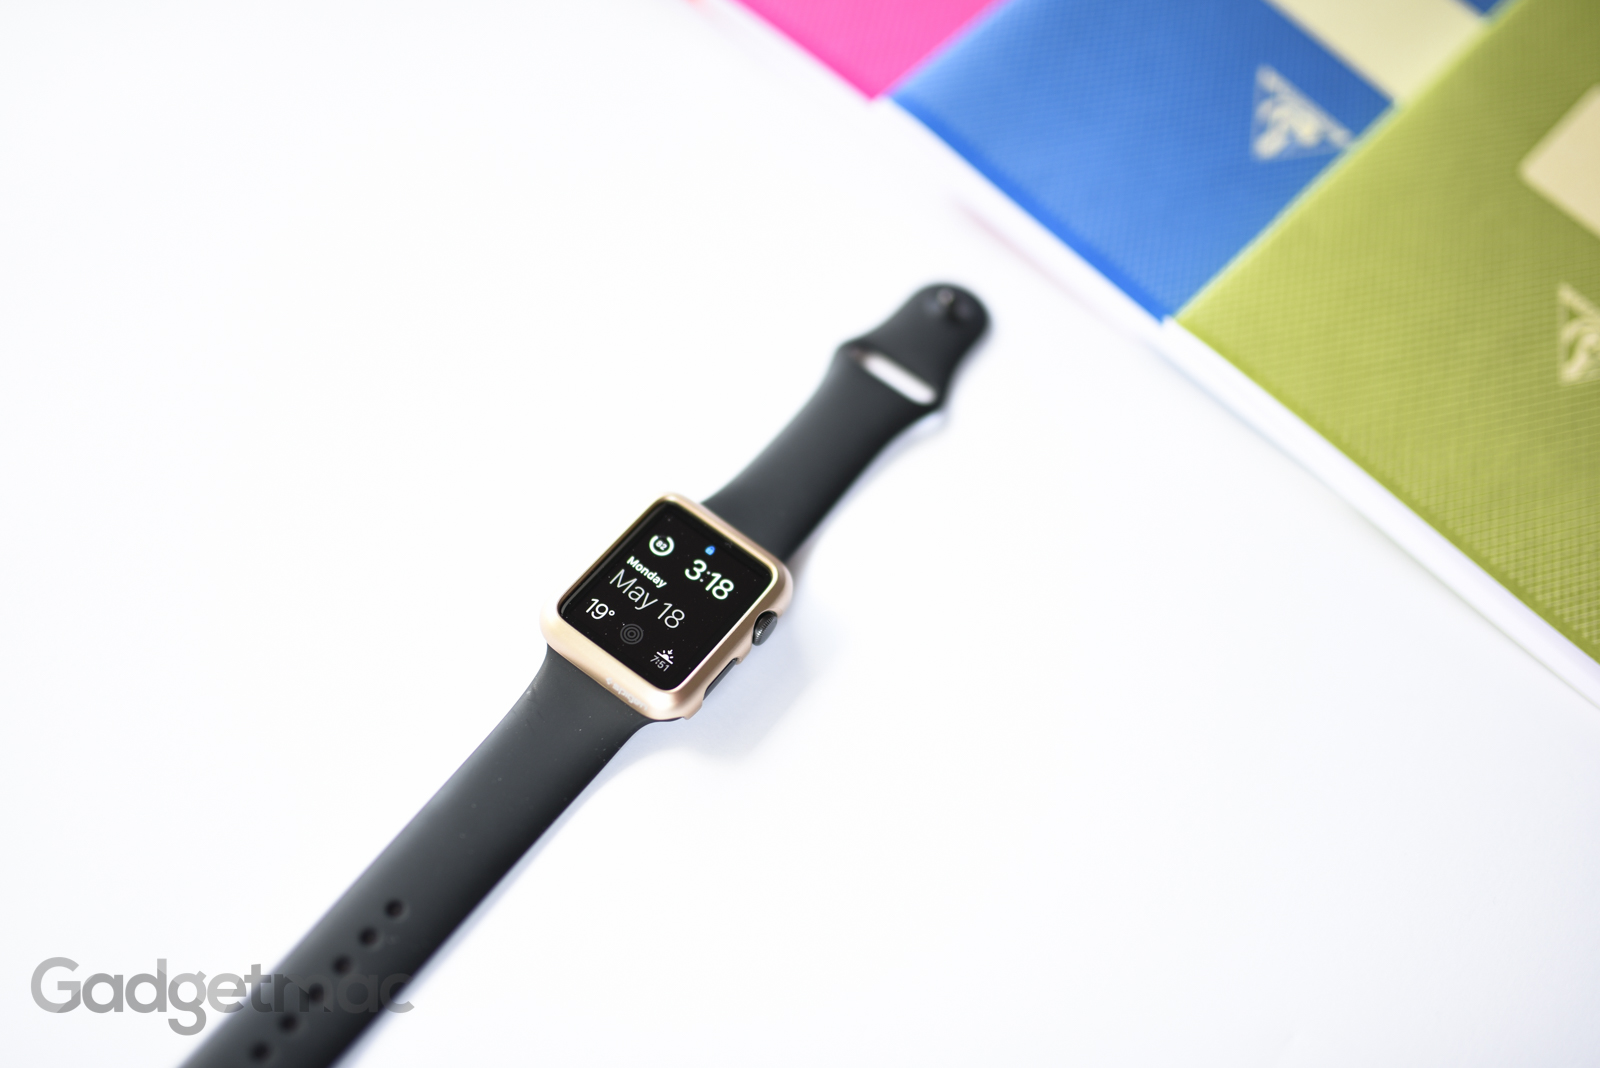 spigen-champagne-gold-thin-fit-case-for-apple-watch.jpg